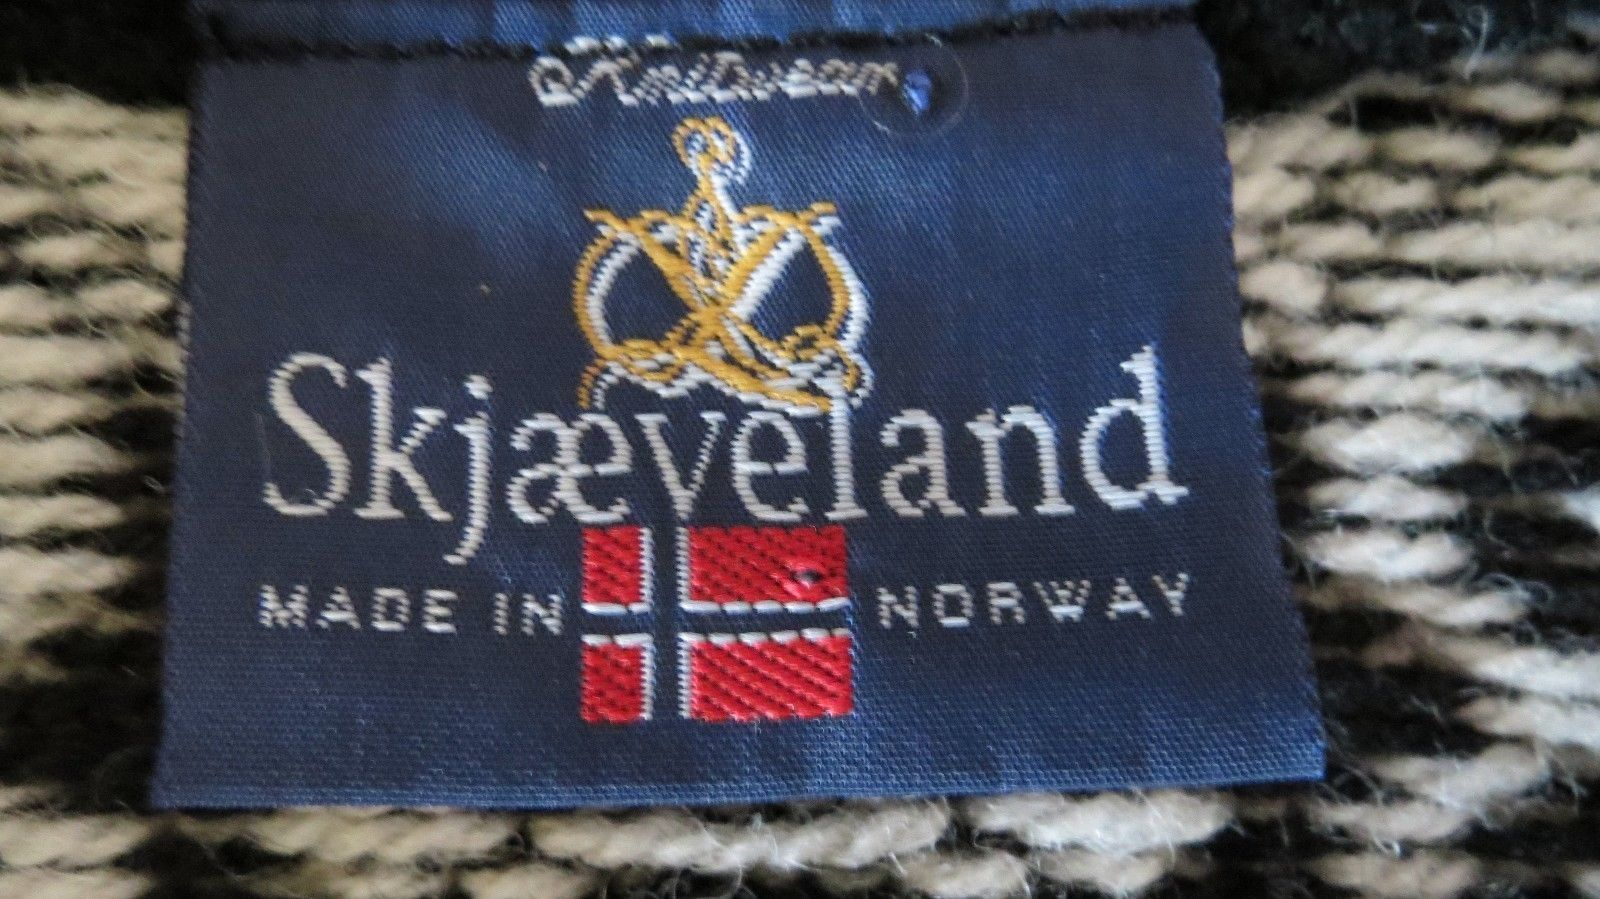 Norway Fair Isle Skjaeveland Norway wool Knitwear Sweater Vest 10 40 bust